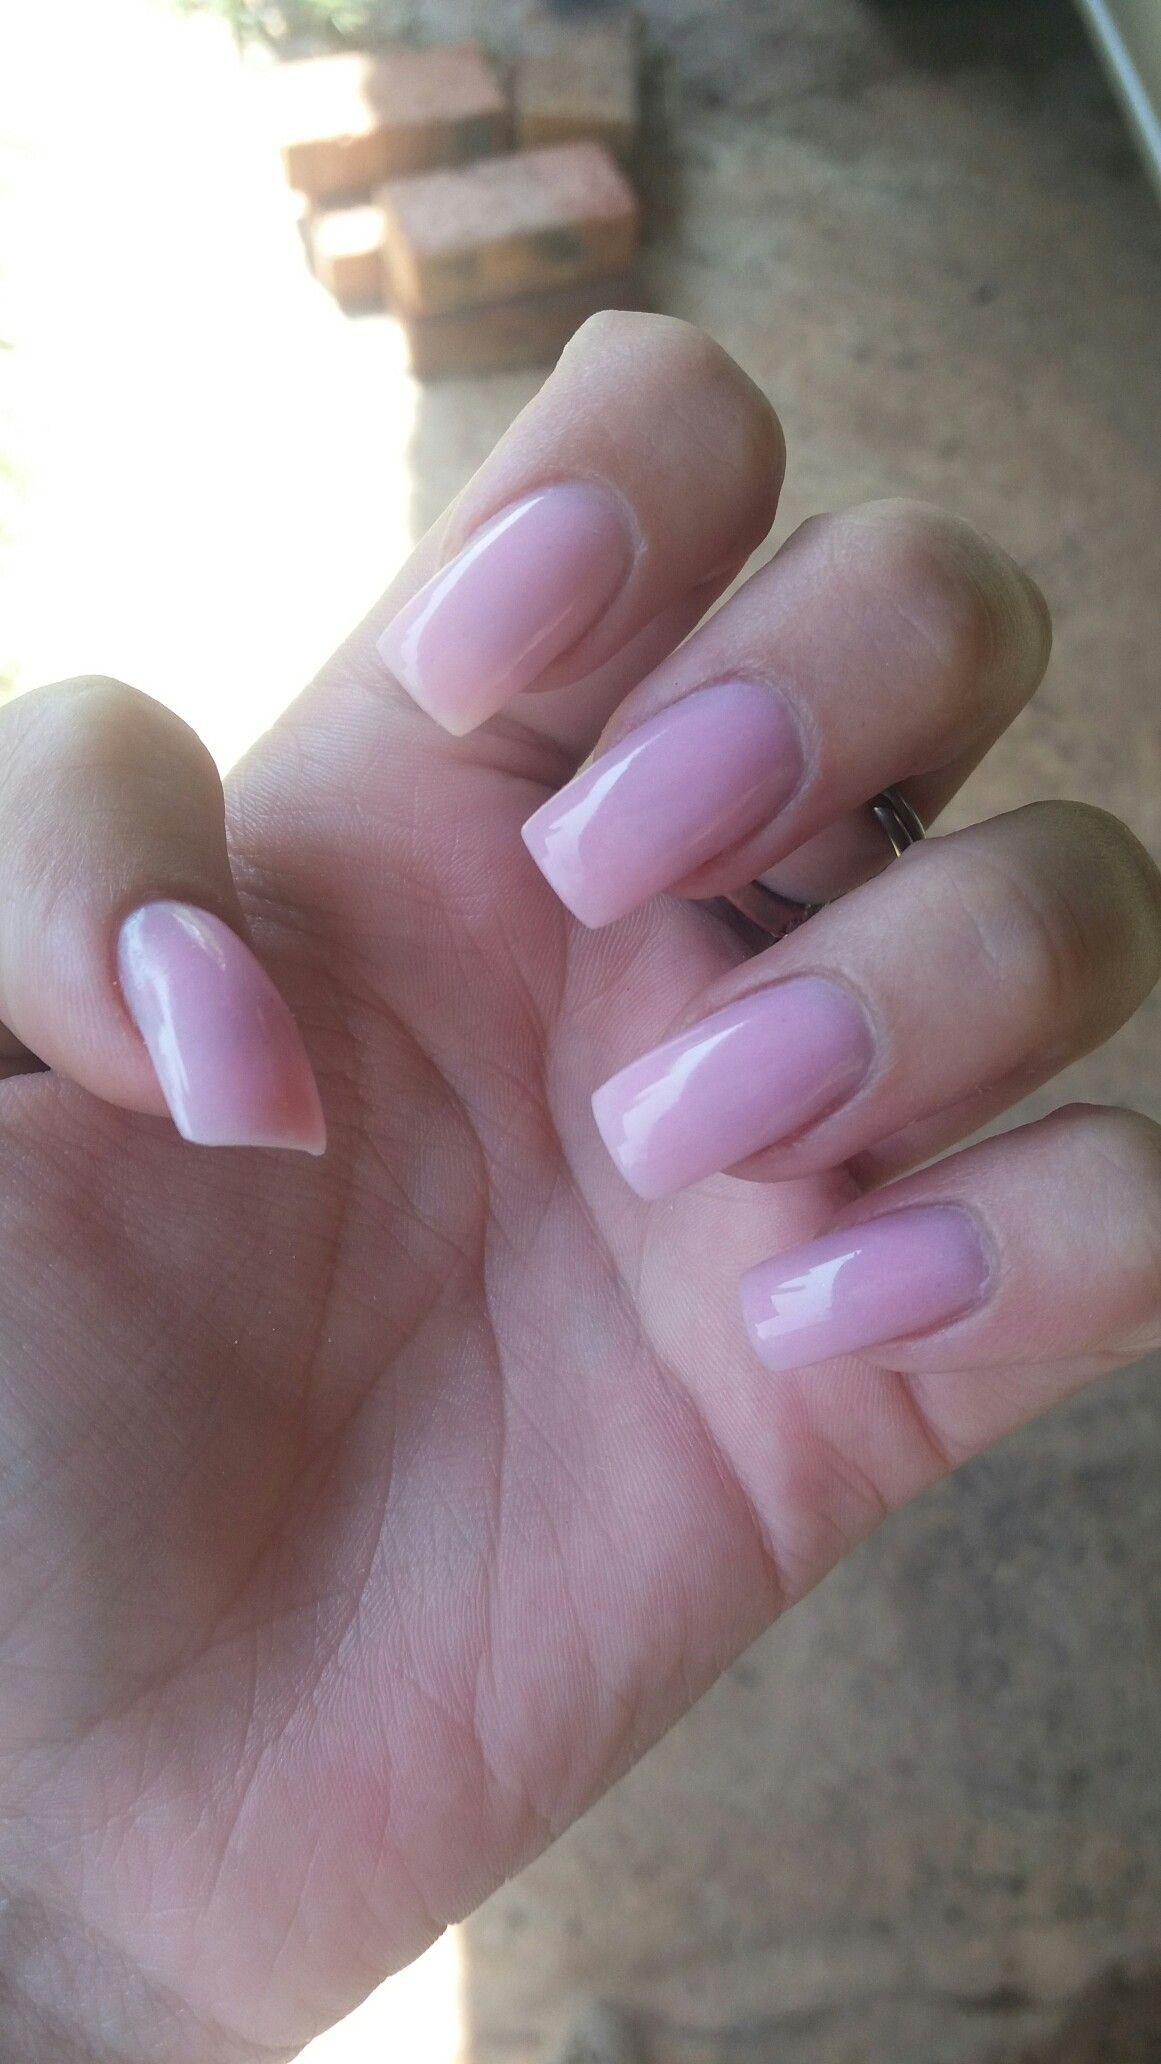 Acrylic nails plain pink LOVE ! - Acrylic Nails Plain Pink LOVE ! Nails Acrylic Nails, Nails, Nail